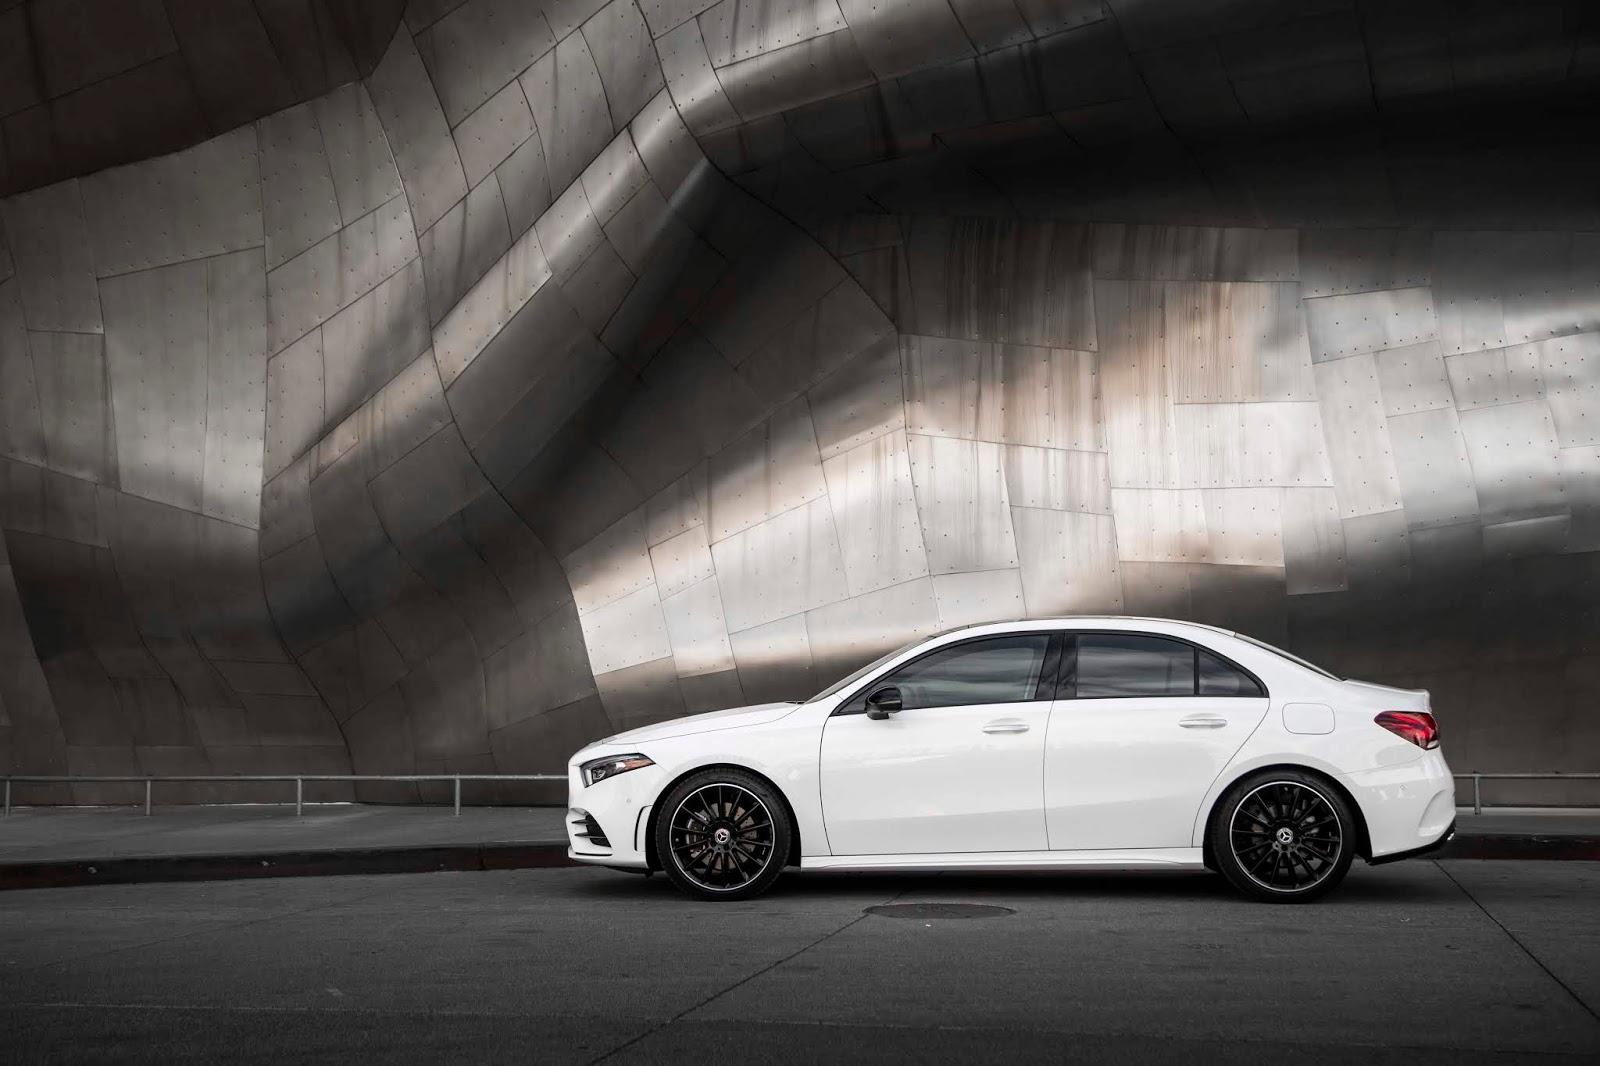 18C0775 020 Από 28.230 ευρώ η τιμή της Mercedes A-Class Sedan Luxury sedan, Mercedes, Mercedes AMG, premium sedan, sedan, zblog, καινούργιο, καινούρια, τιμες